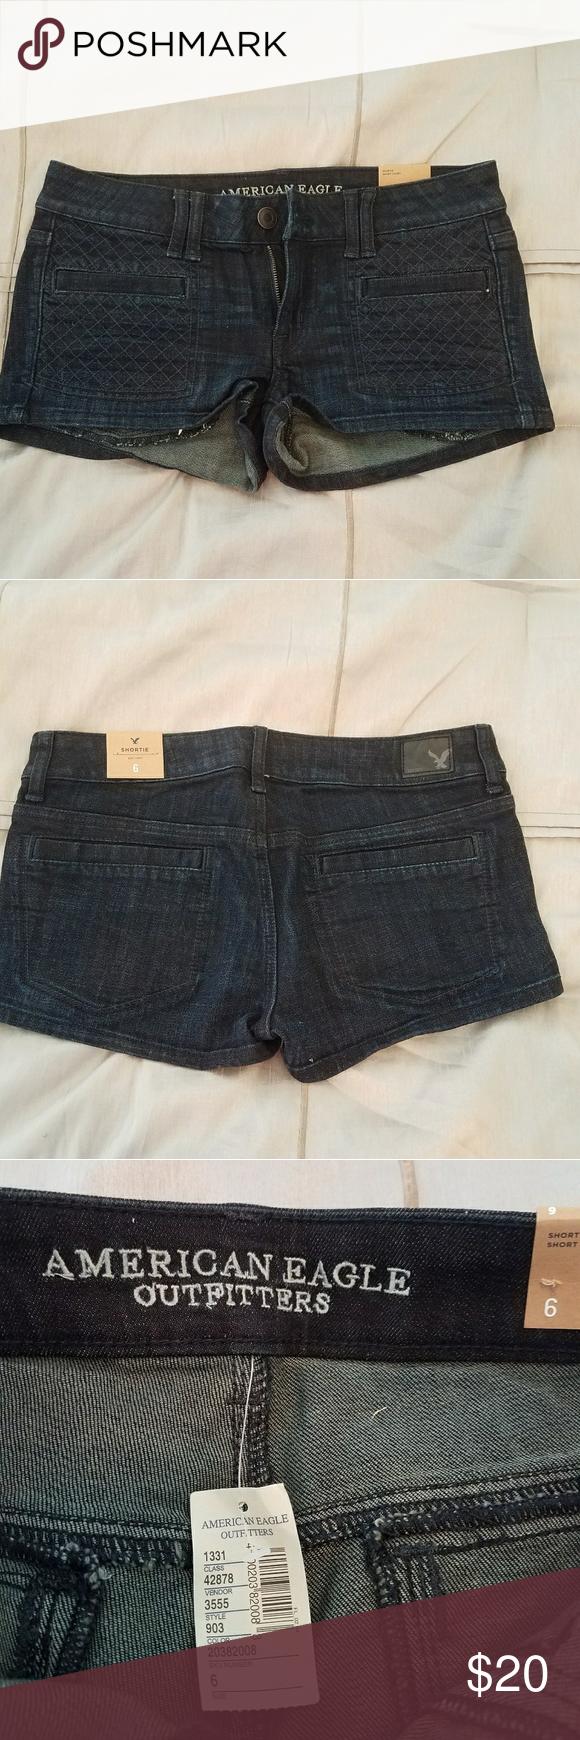 American eagle brand new denim shorts nwt crossstitching